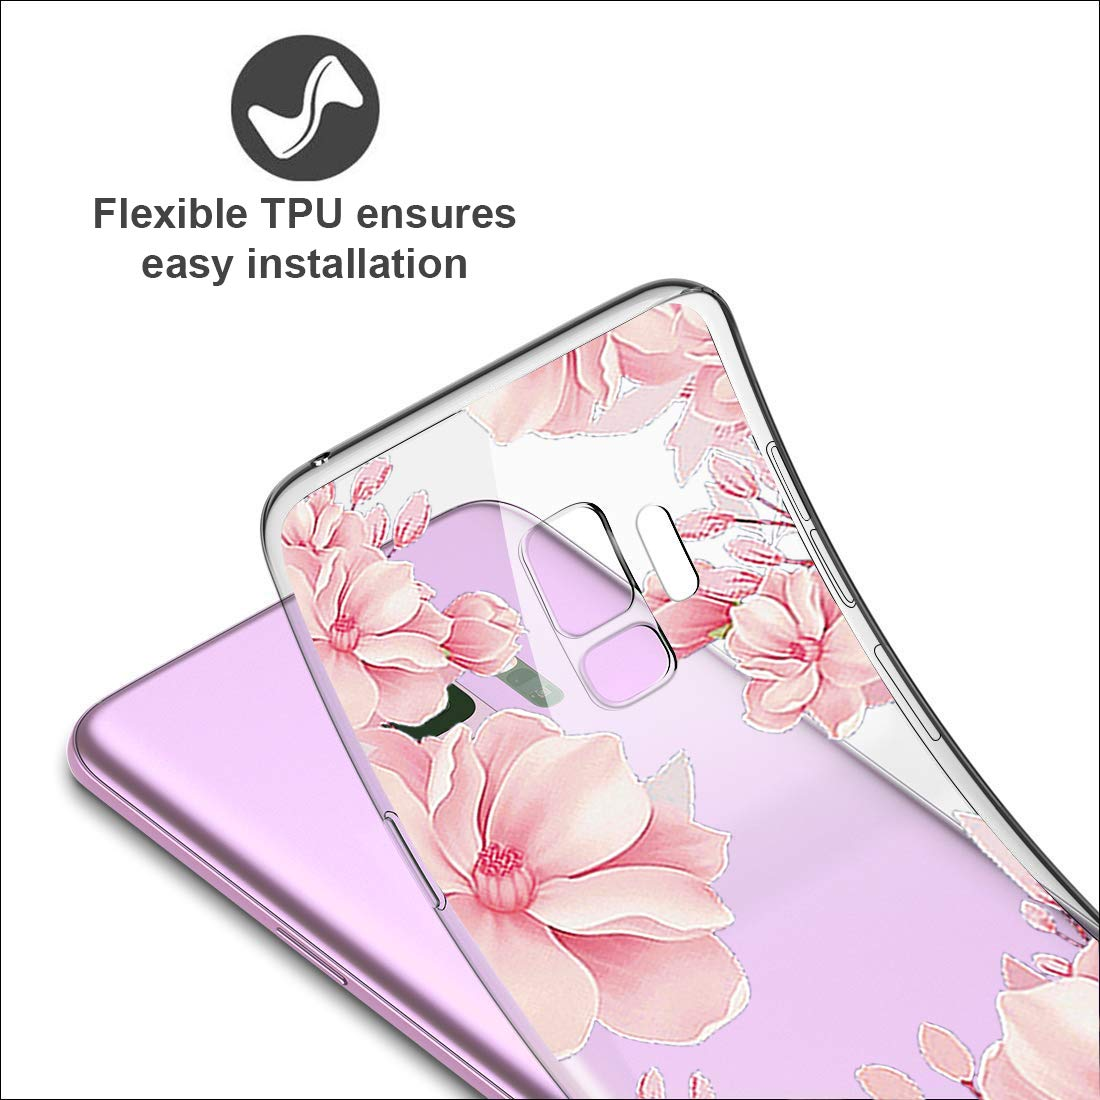 18eay H/ülle Compatible with Samsung Galaxy S9 Plus Transparent Ultra Slim Handyh/ülle TPU Case Sto/ßd/ämpfend Bumper Pattern Handytasche Cover f/ür Galaxy S9 schutzh/ülle/ülle